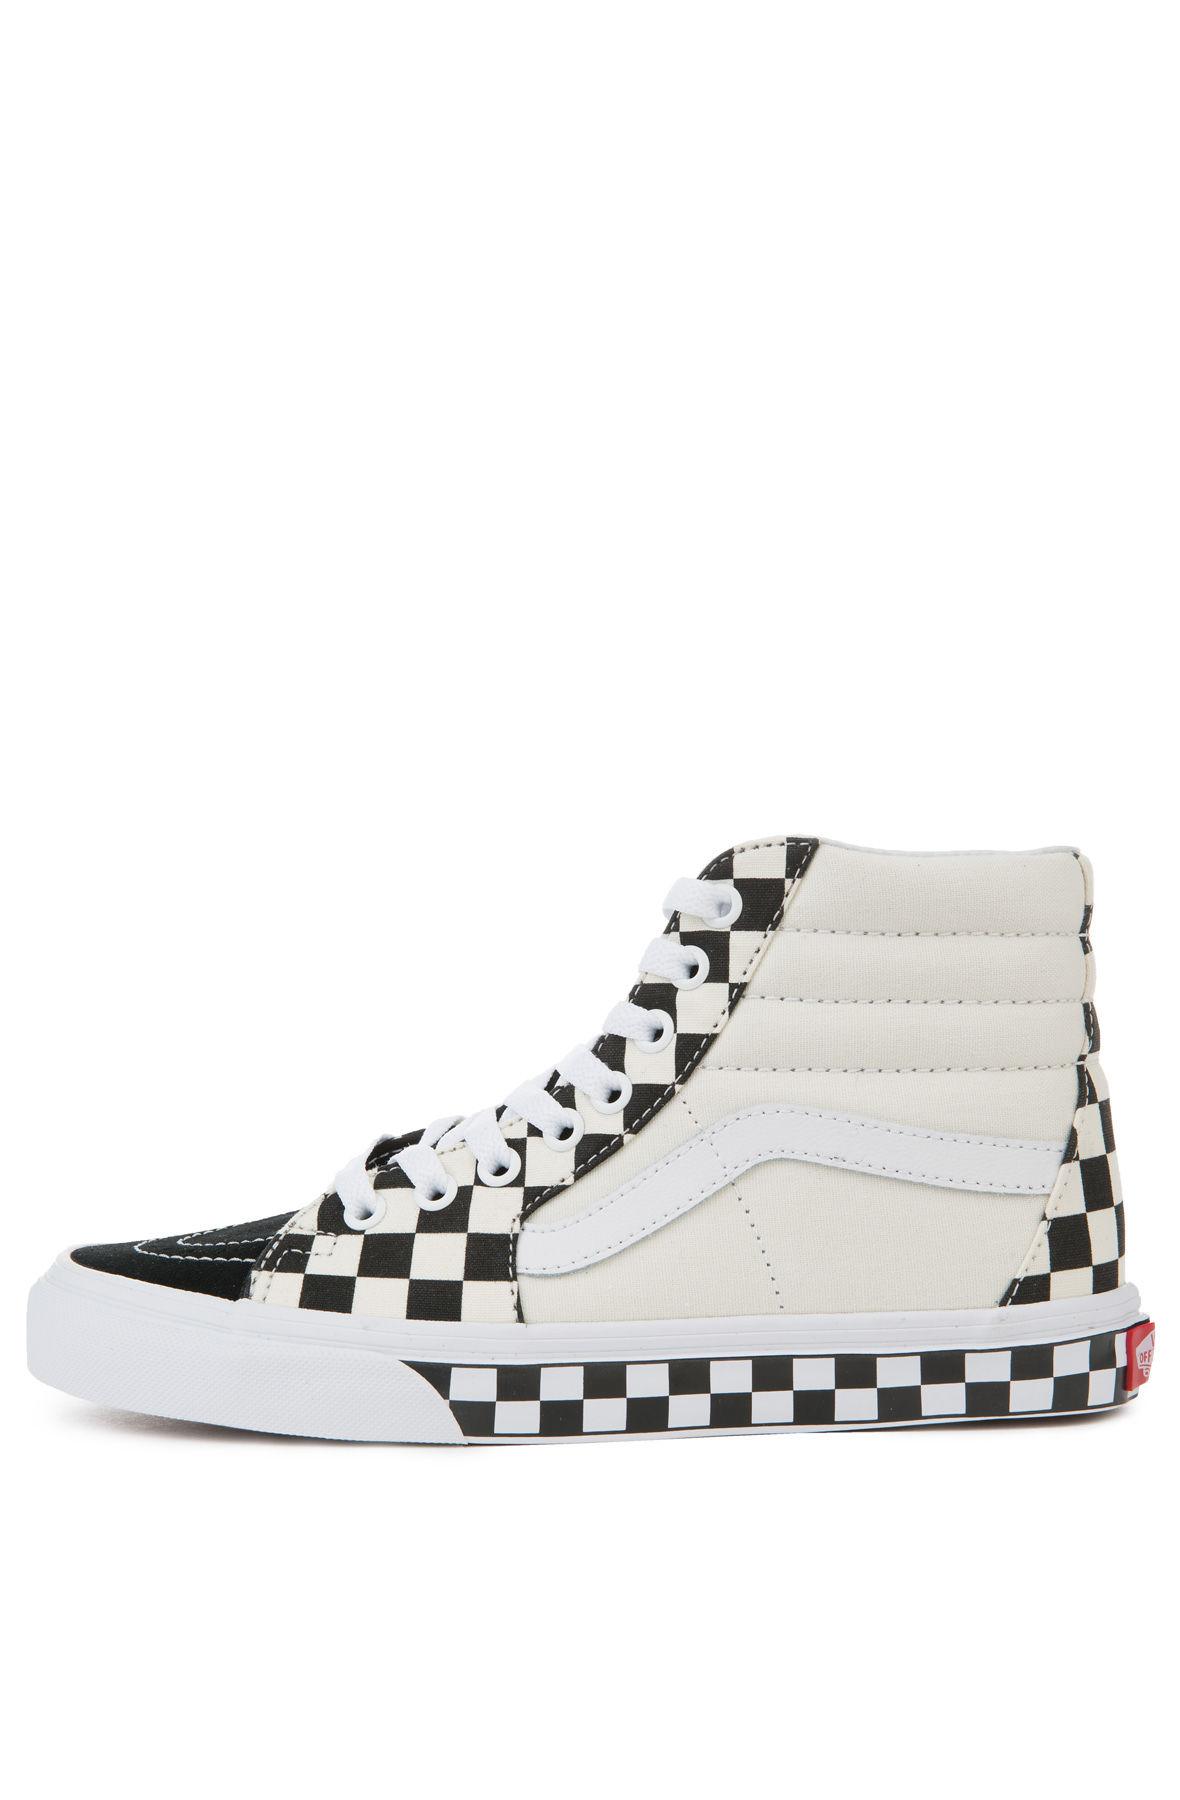 VANS Sneaker Women s Sk8-Hi Checker Sidewall Black True White 208c874df